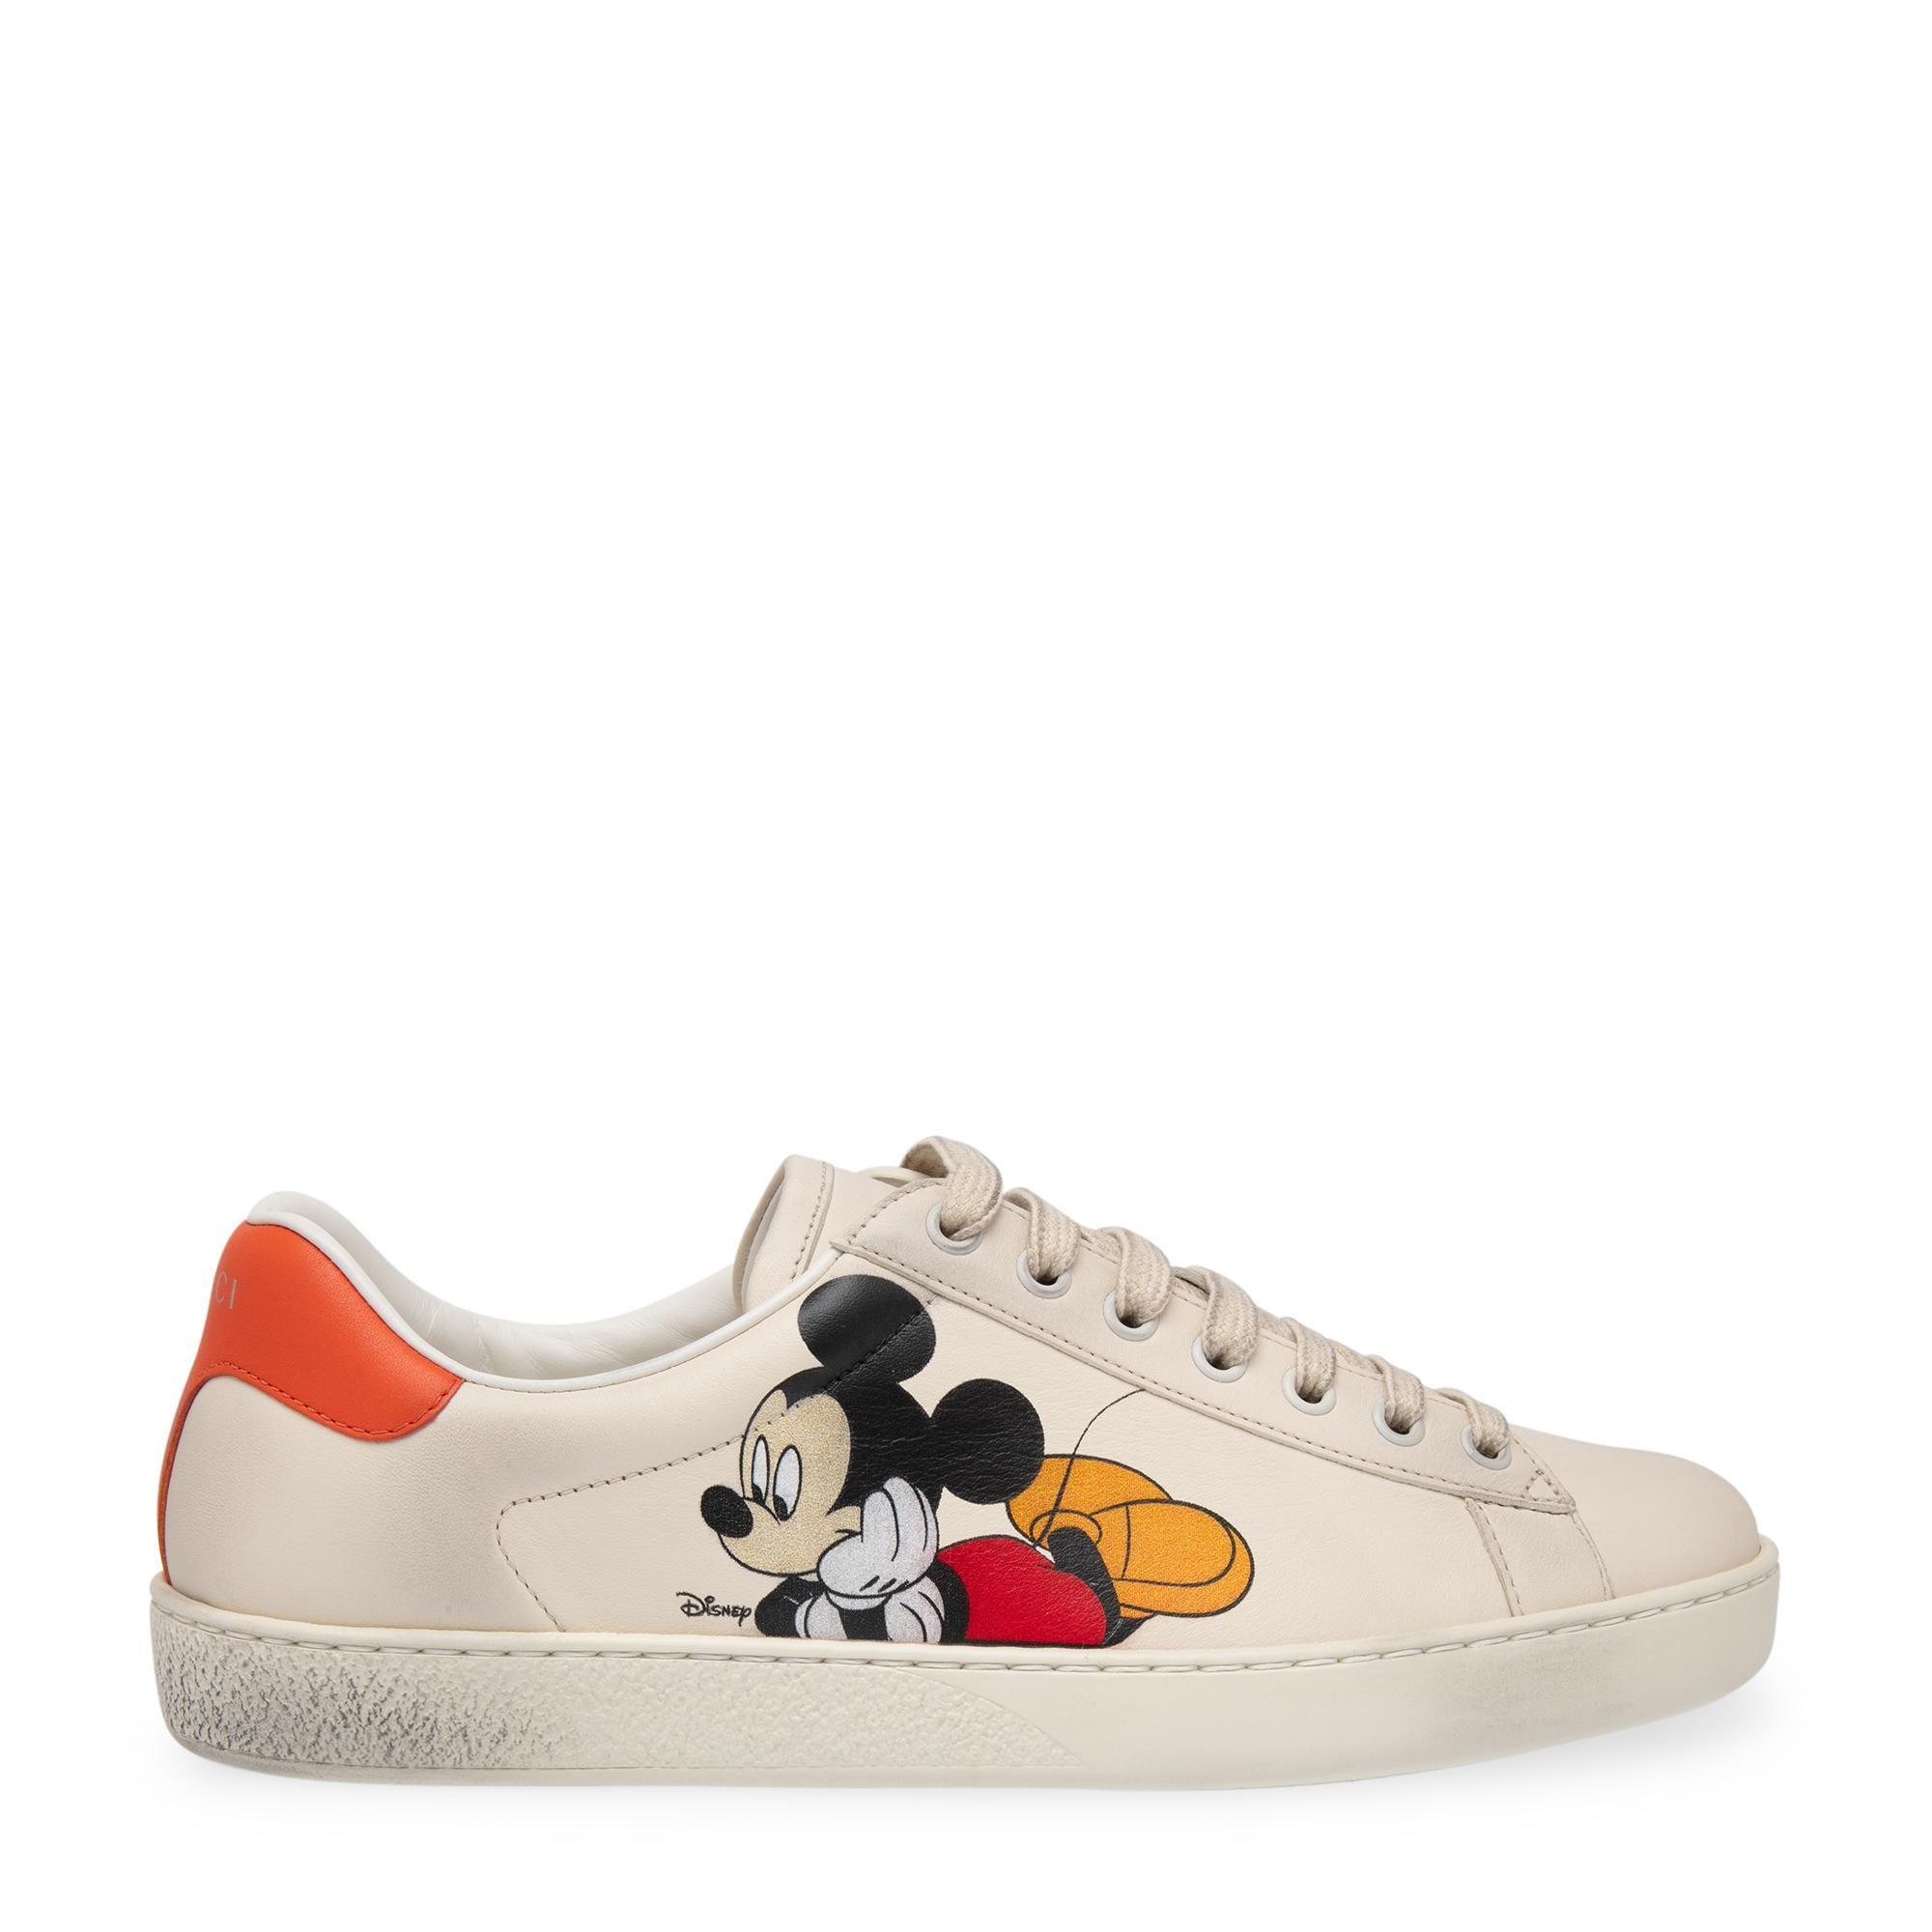 x Disney Ace sneakers